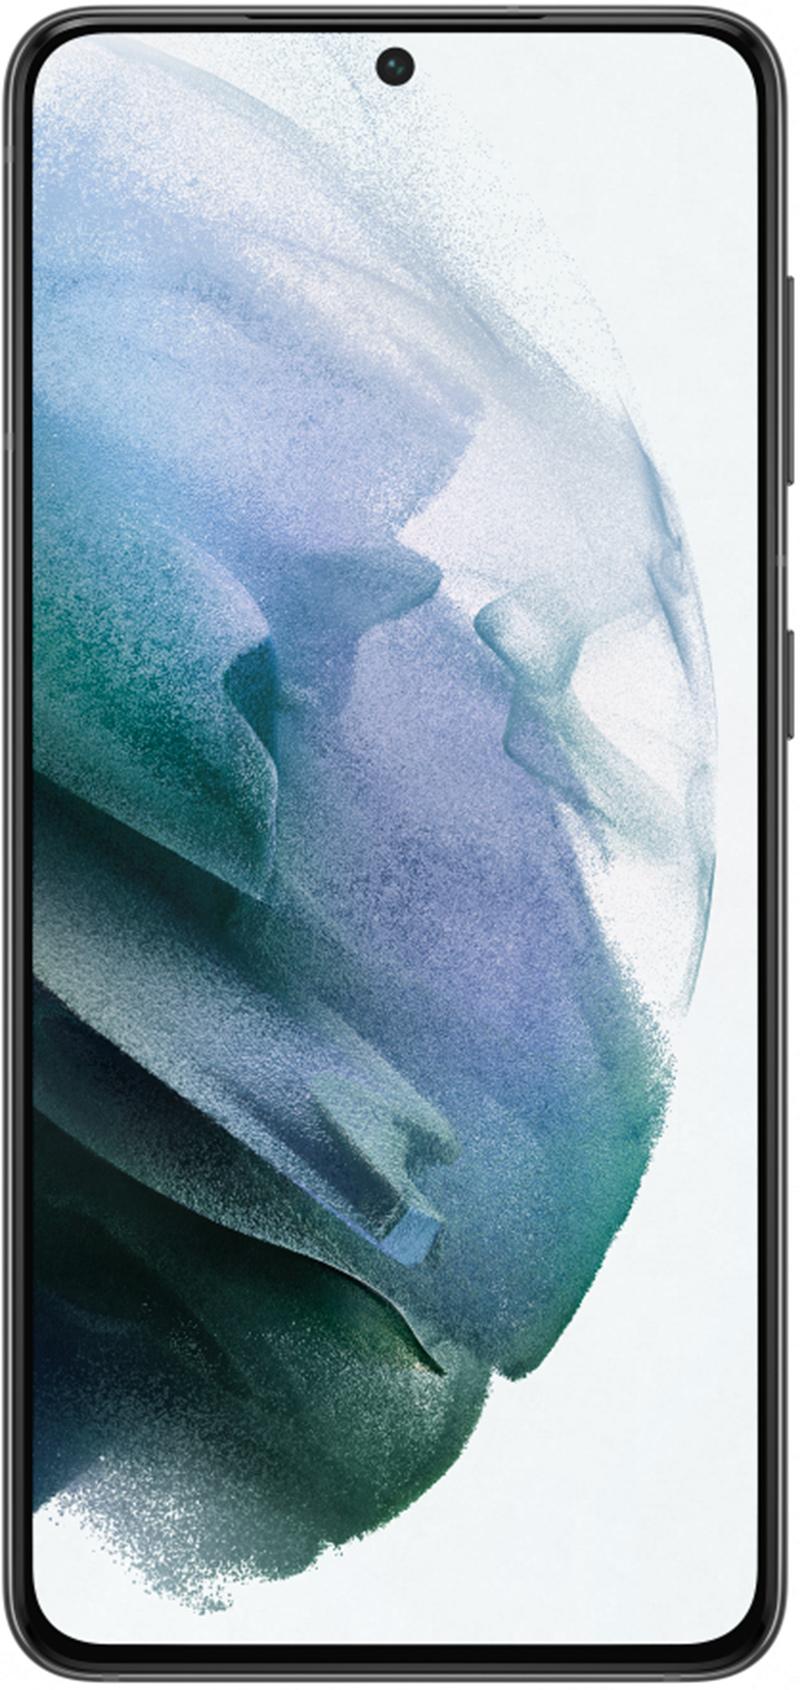 Samsung Galaxy S21 5G noir 128Go